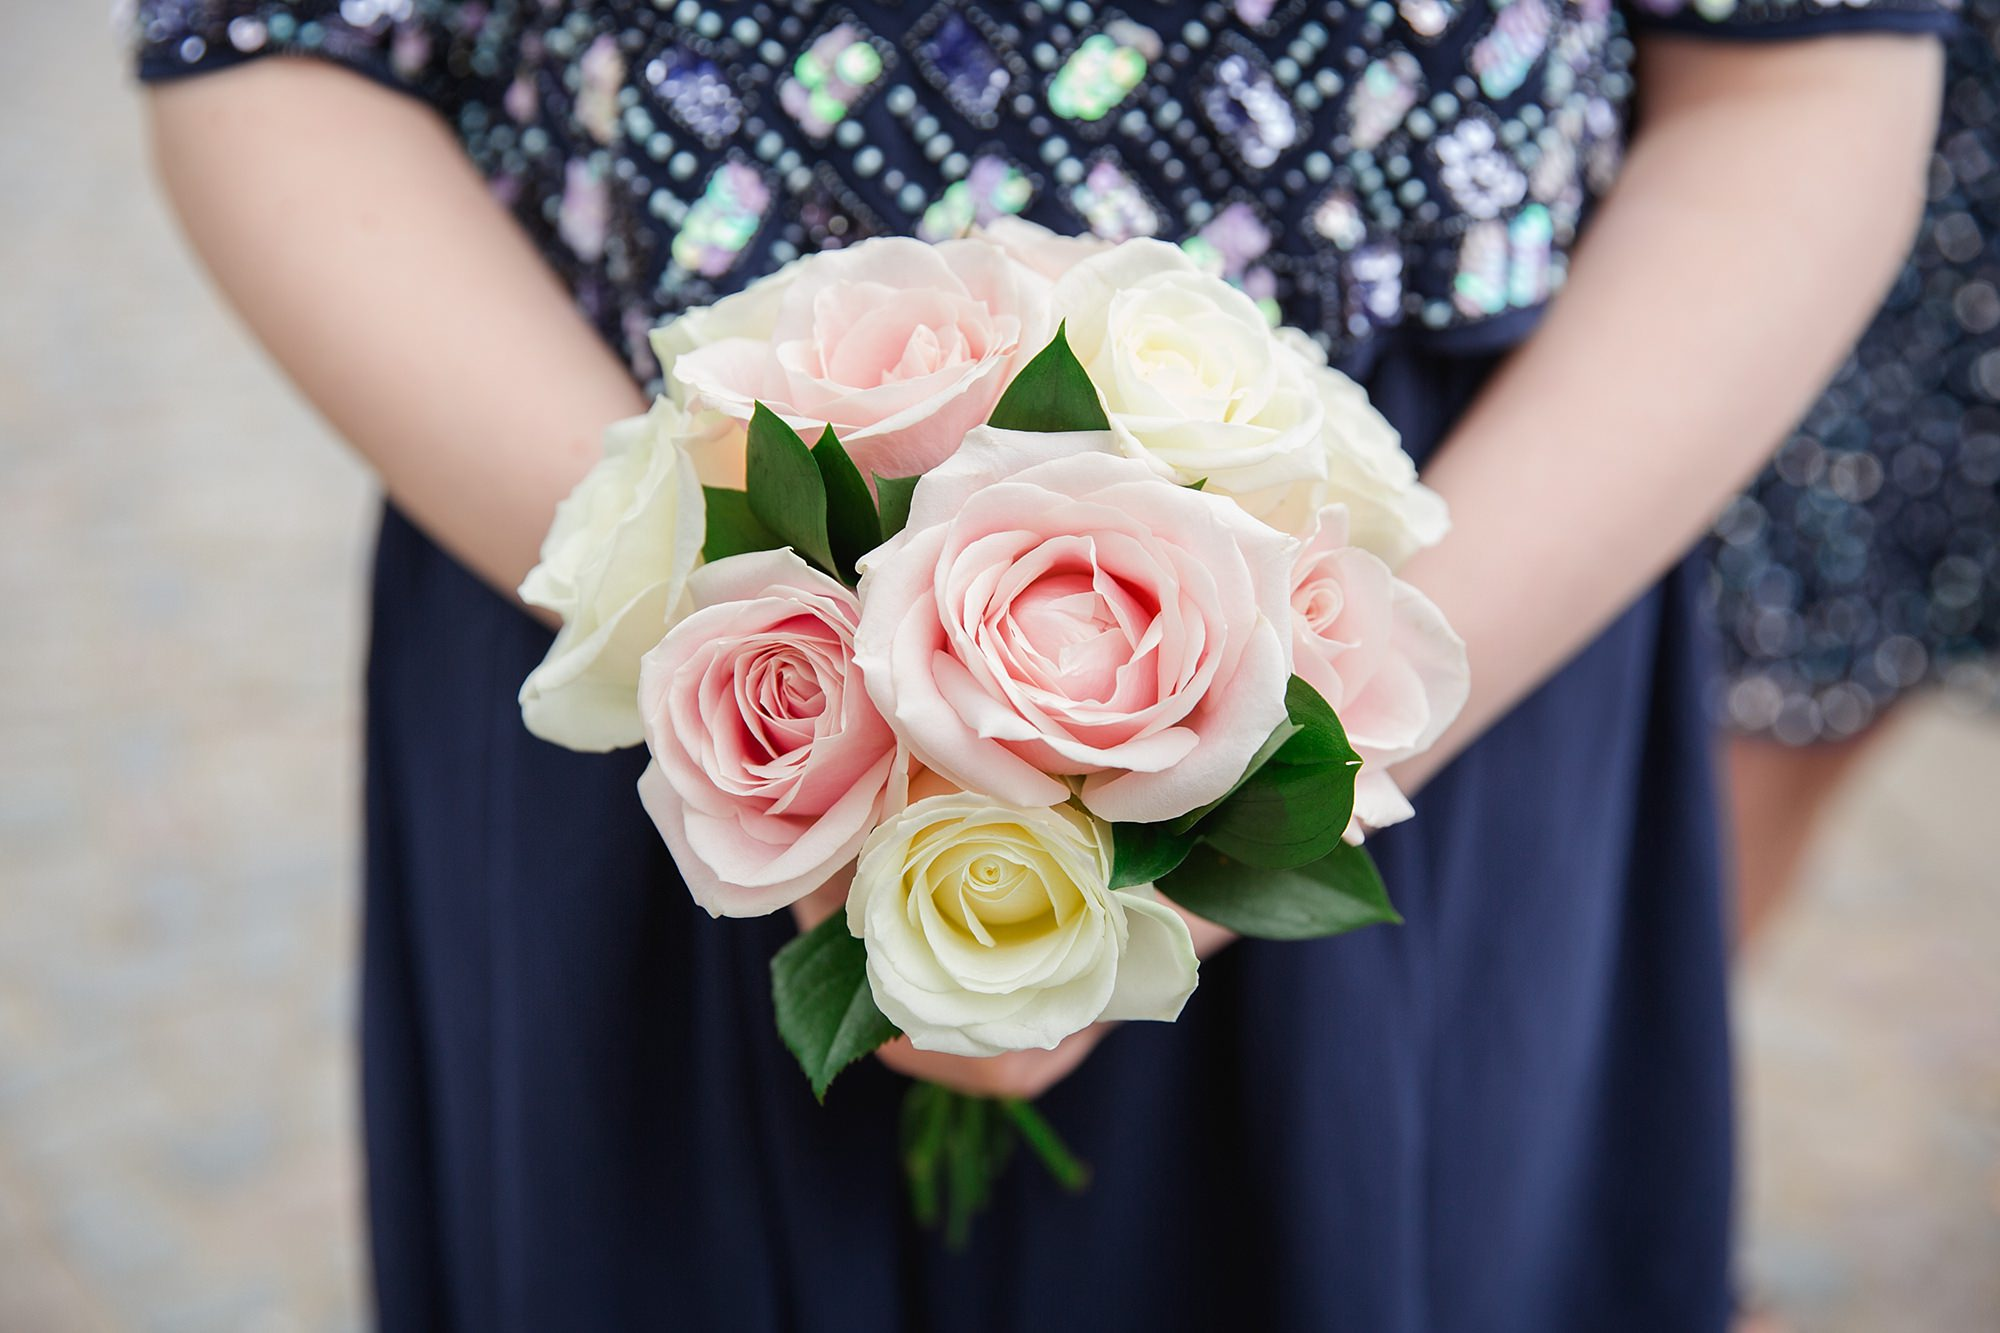 Trafalgar Tavern wedding bridesmaids bouquet close up